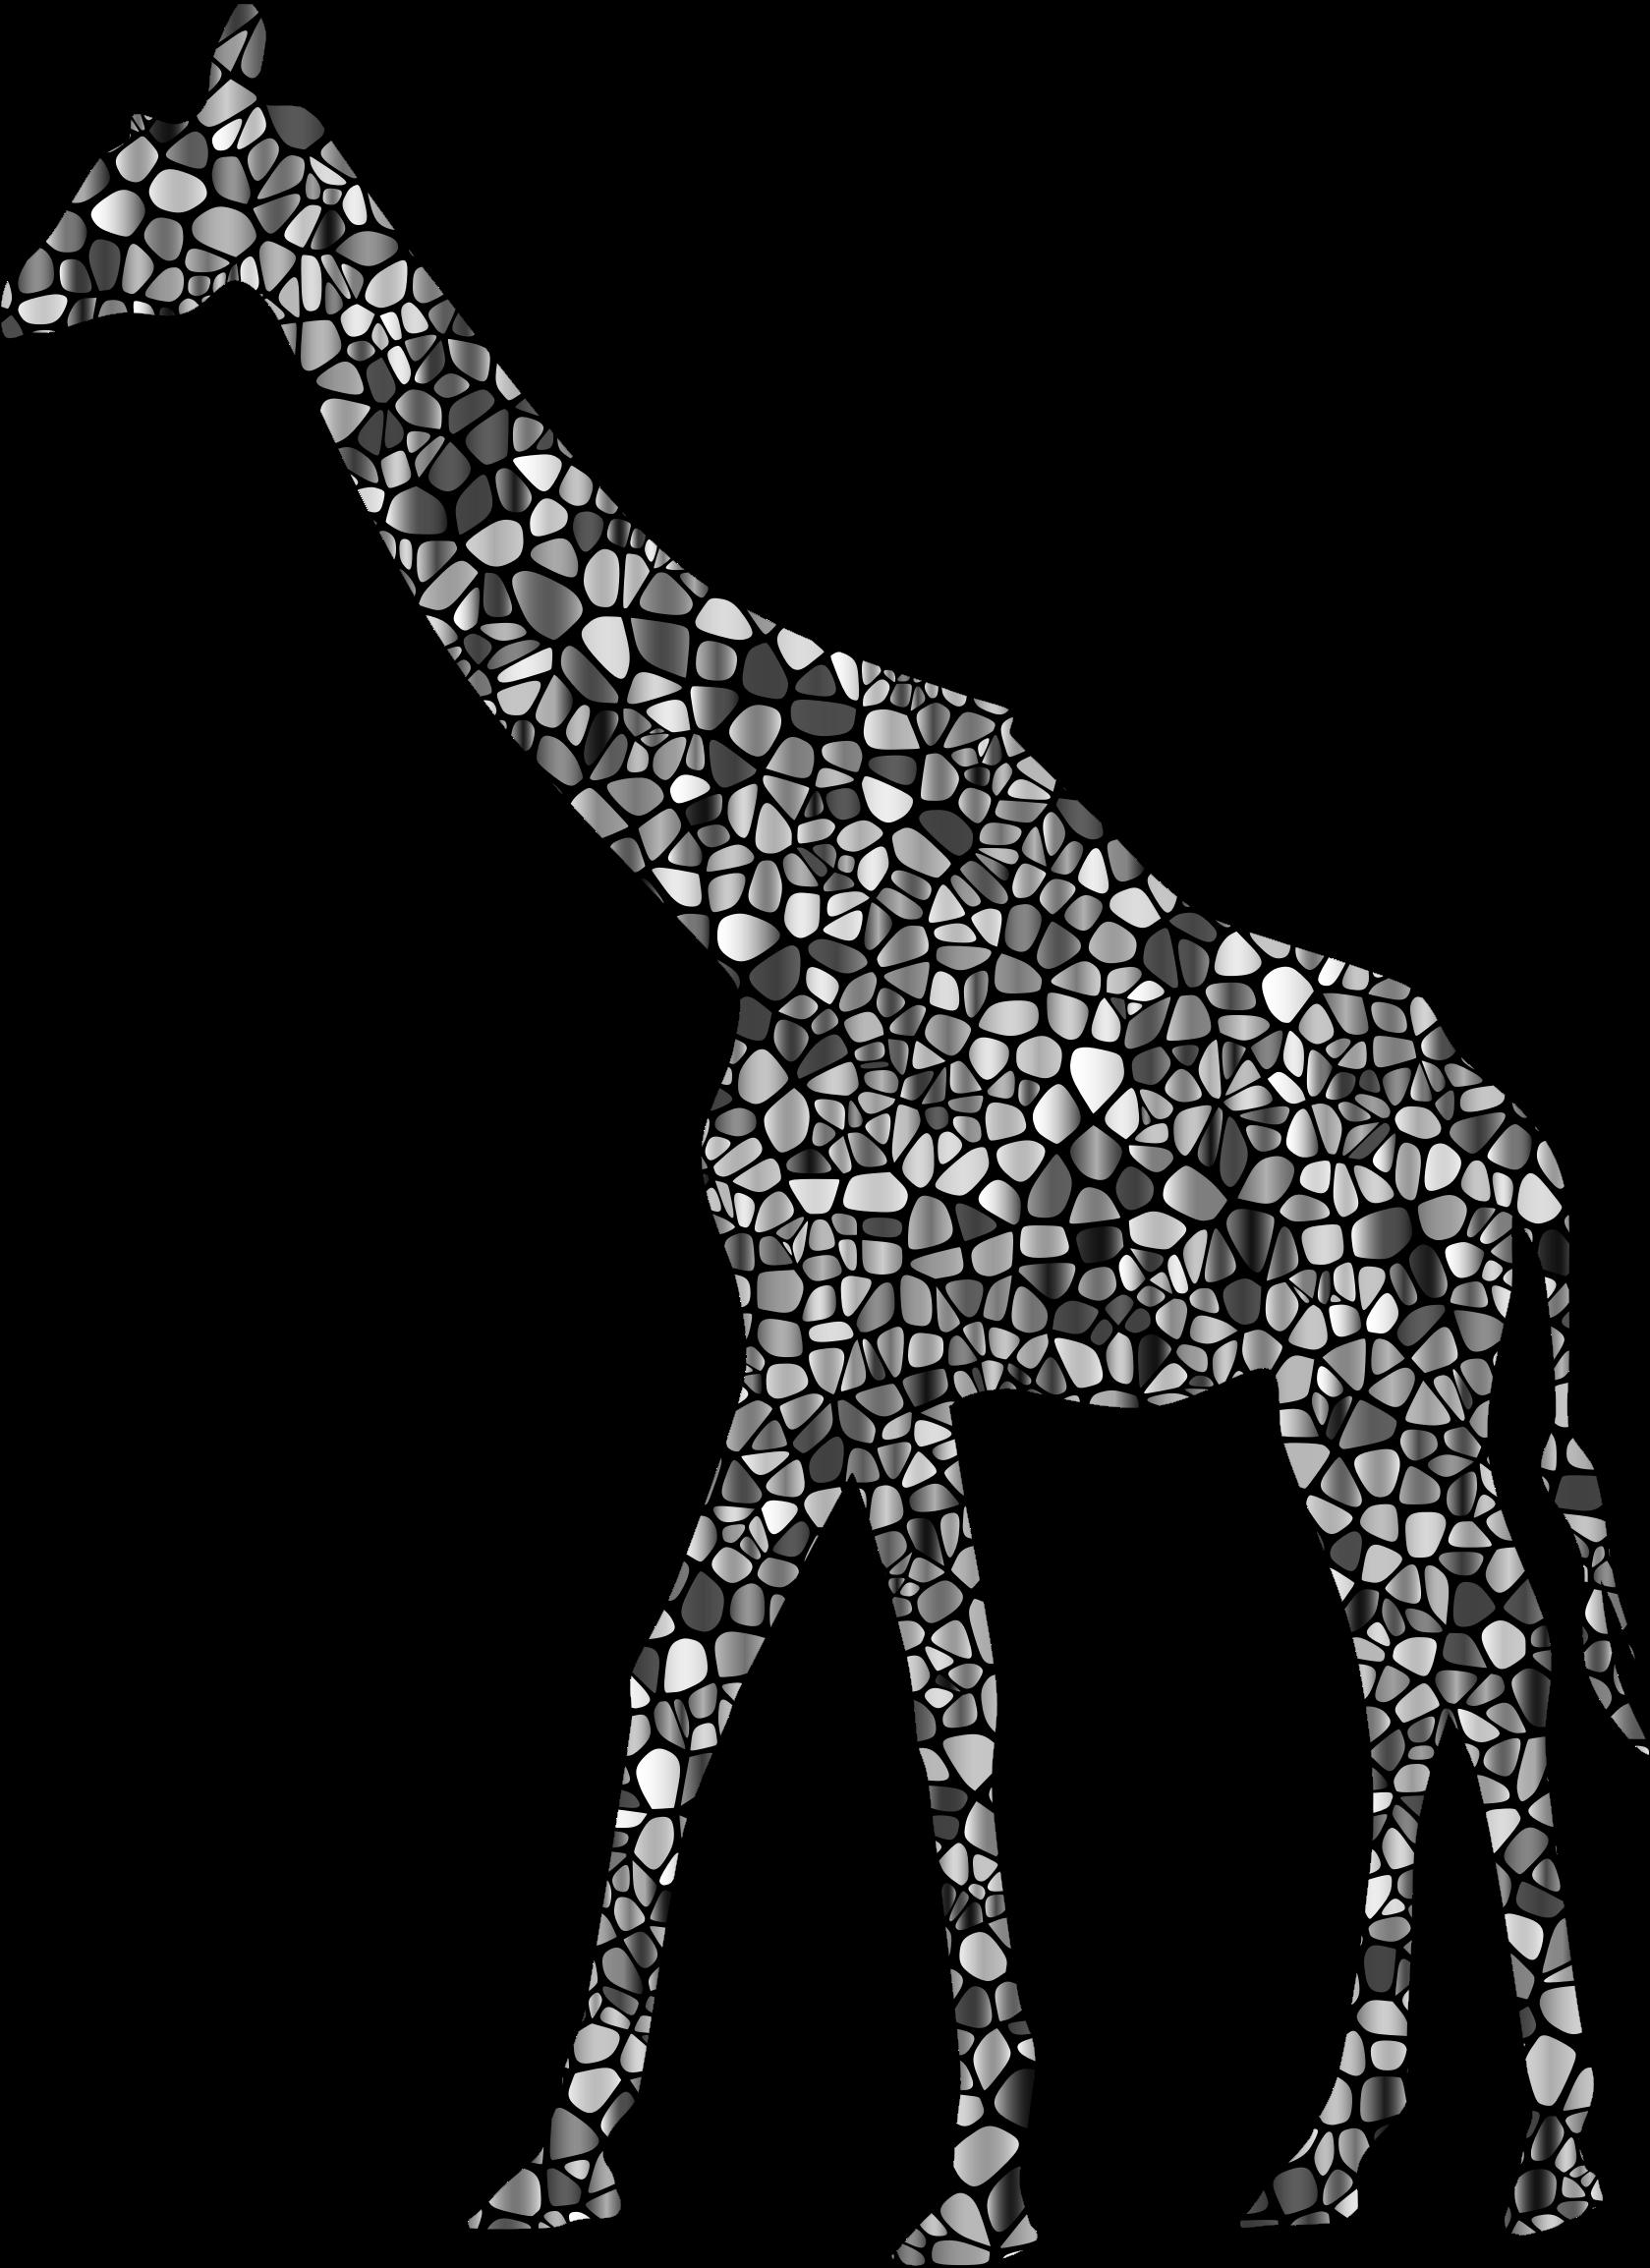 Silhouette animal free black. Clipart zebra giraffe